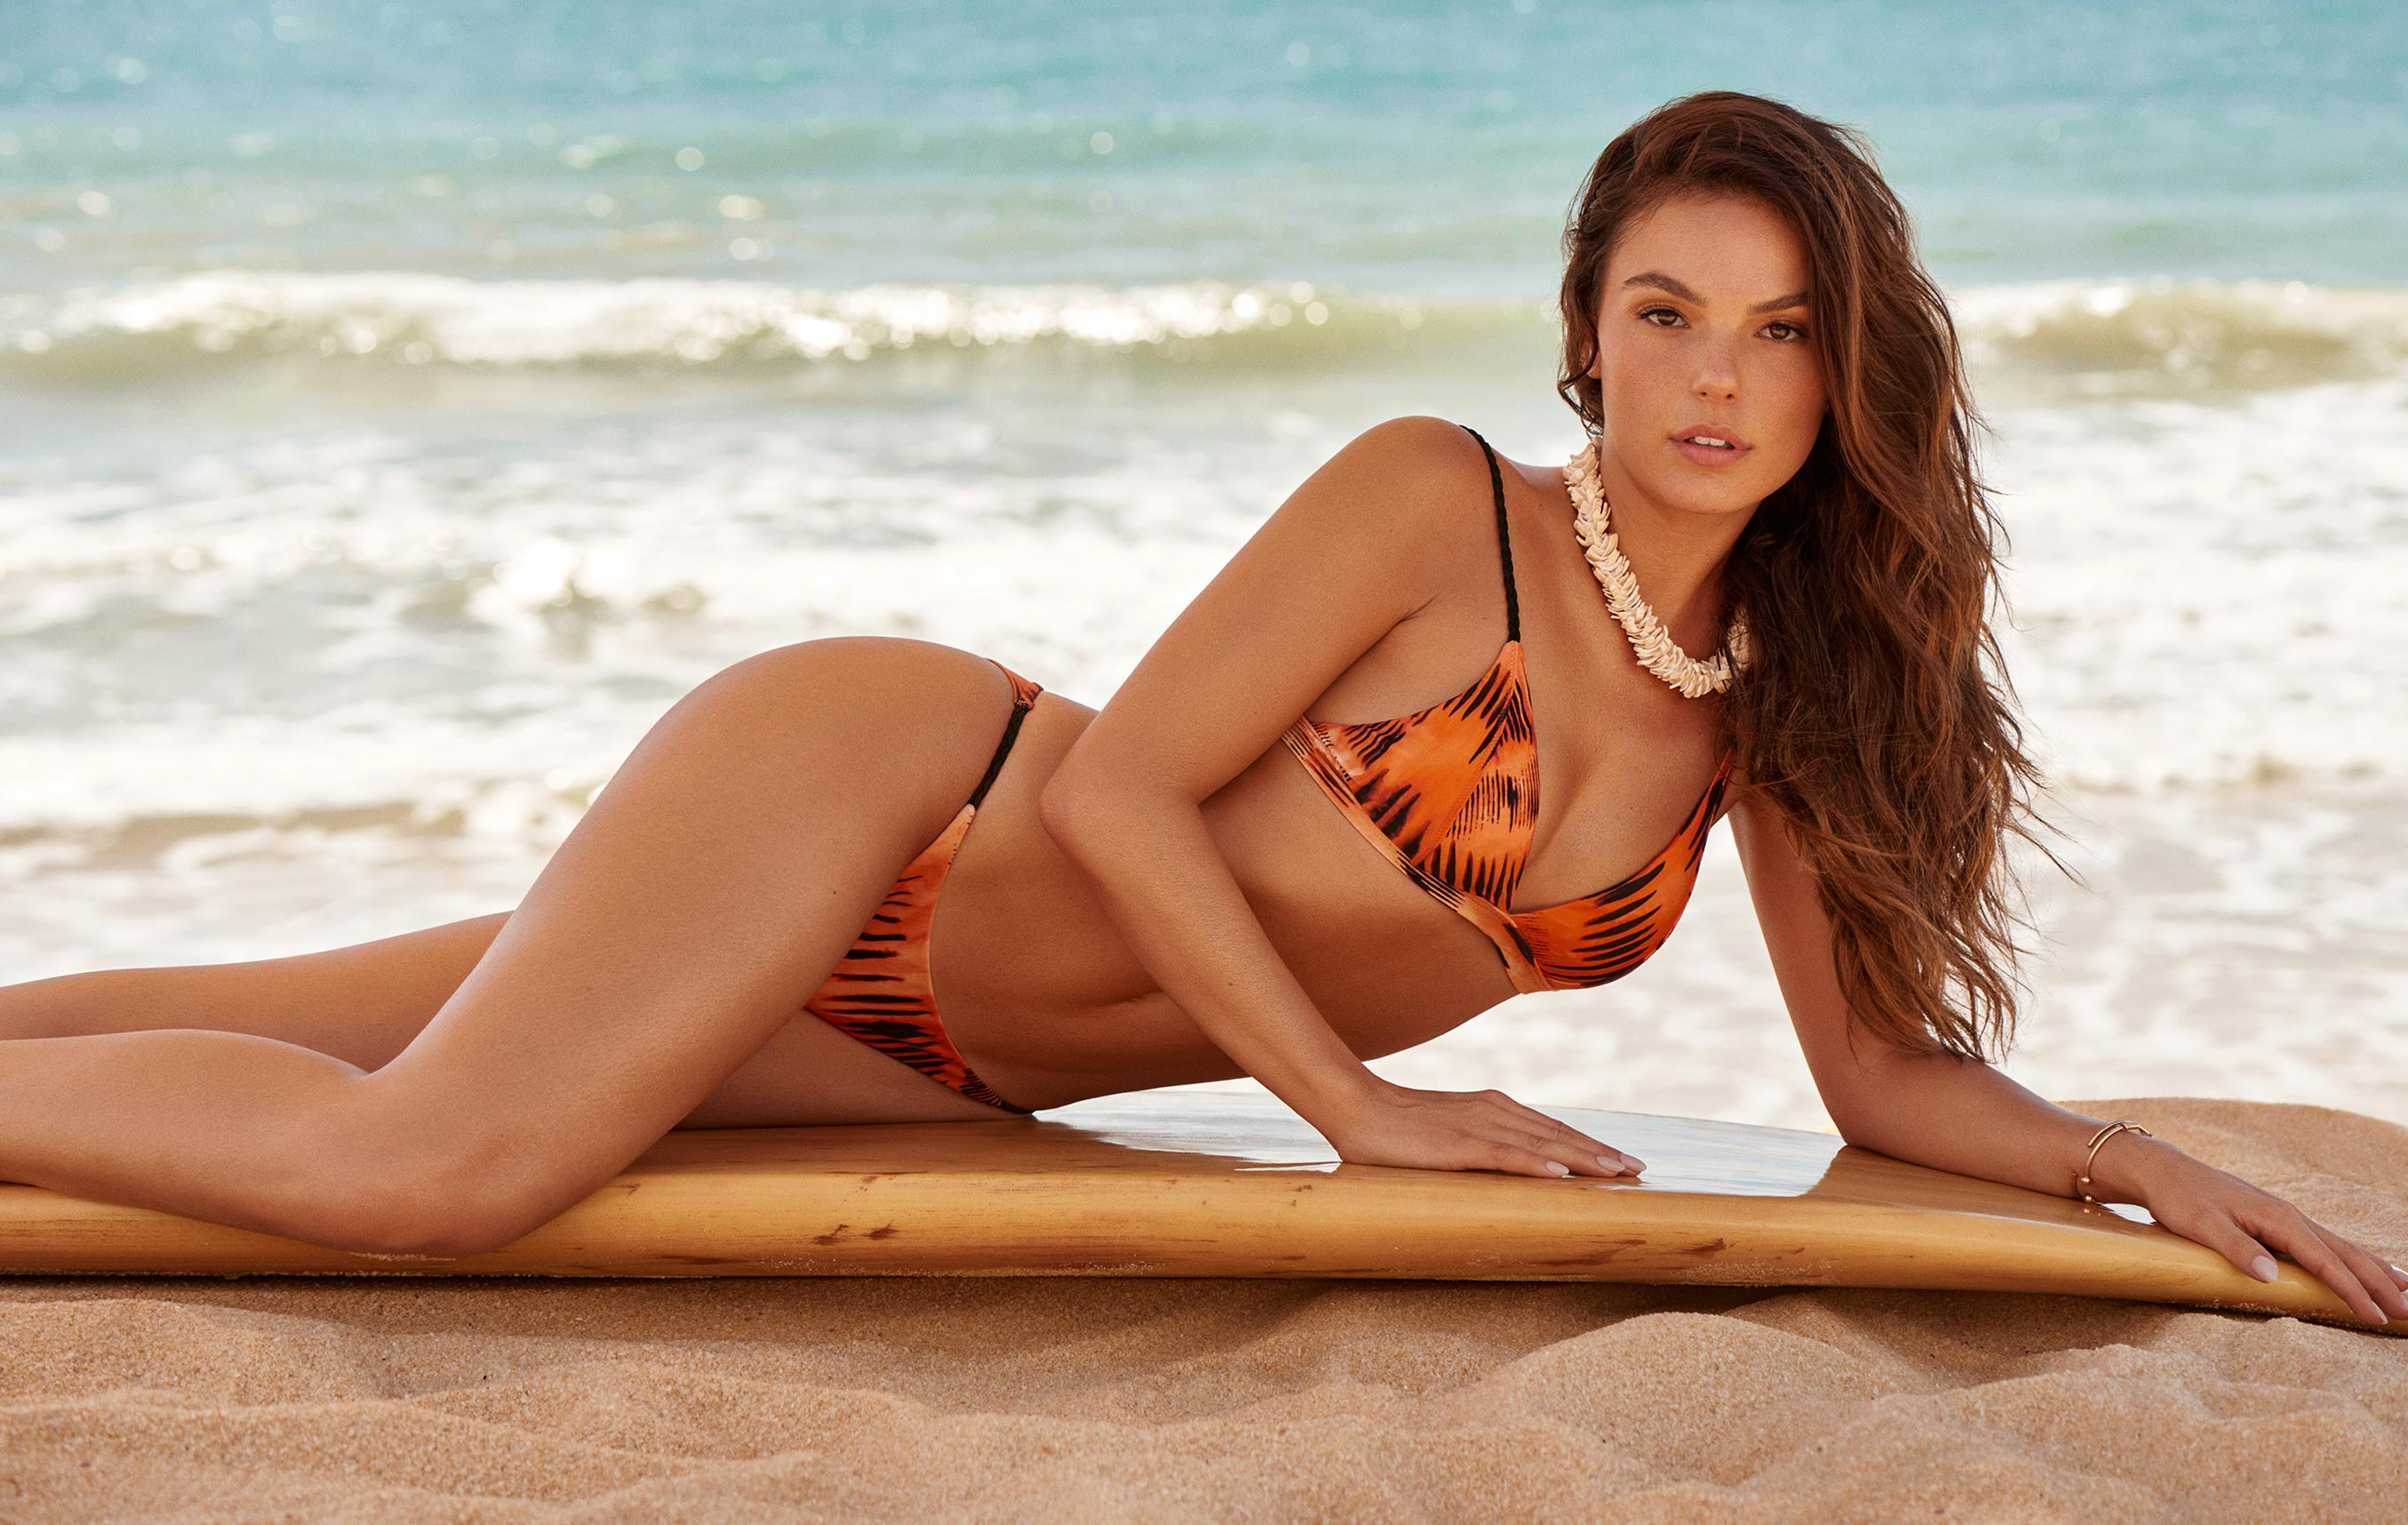 рекламная кампания купальников модного бренда Cia Maritima, сезон весна-лето 2020 / фото 01